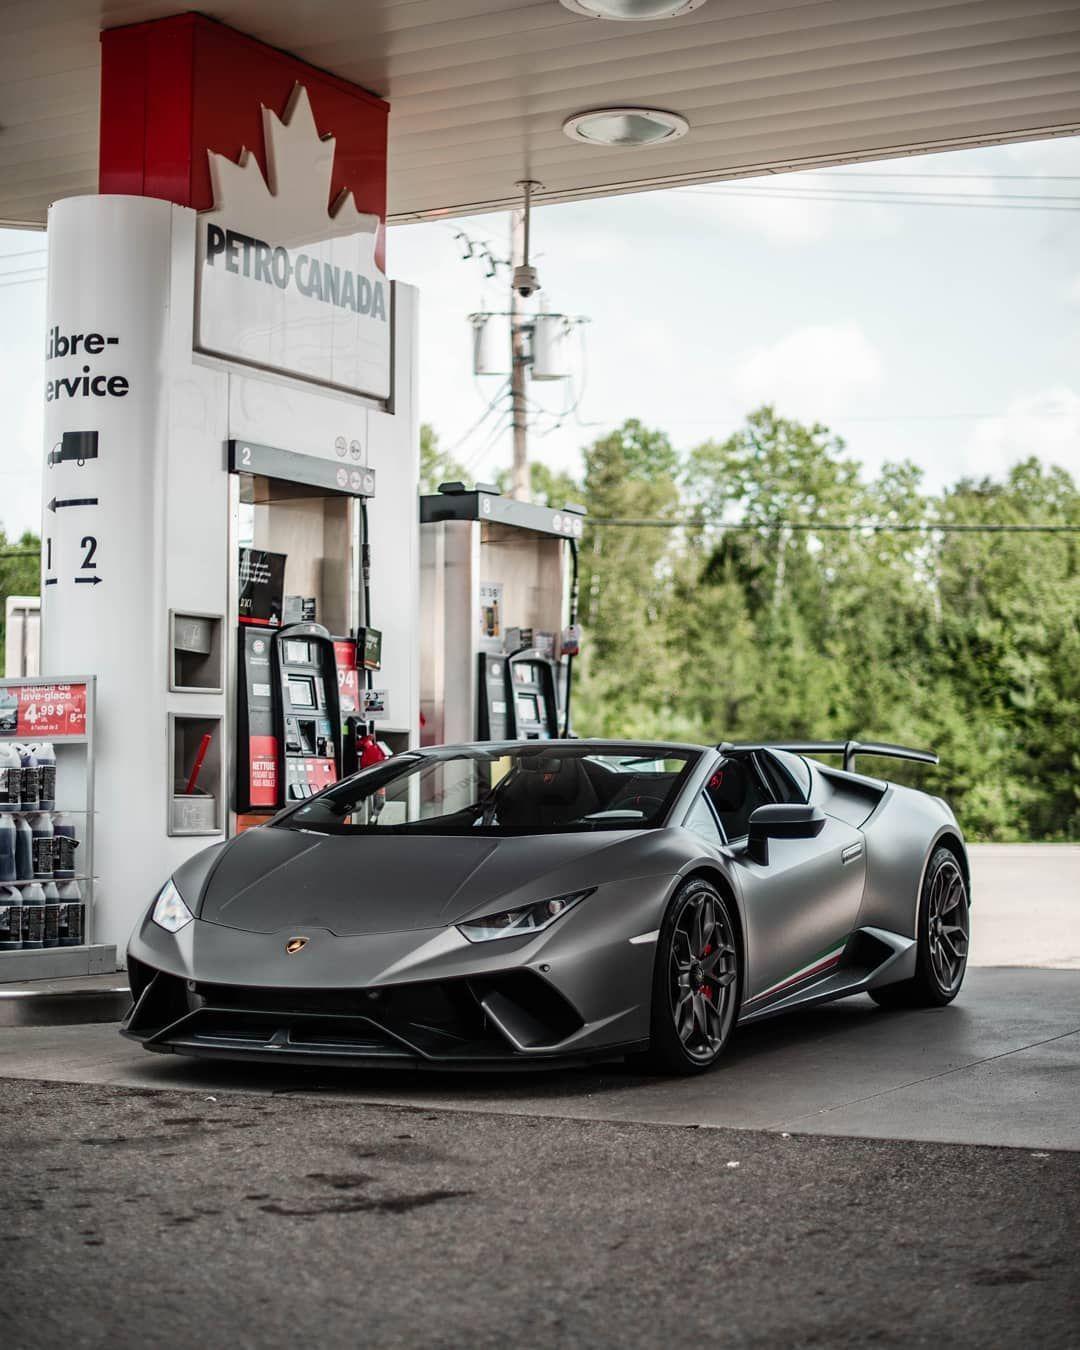 13 Glorious Car Wheels Design Bugatti Veyron Ideas Sports Cars Sports Cars Lamborghini Sports Cars Luxury